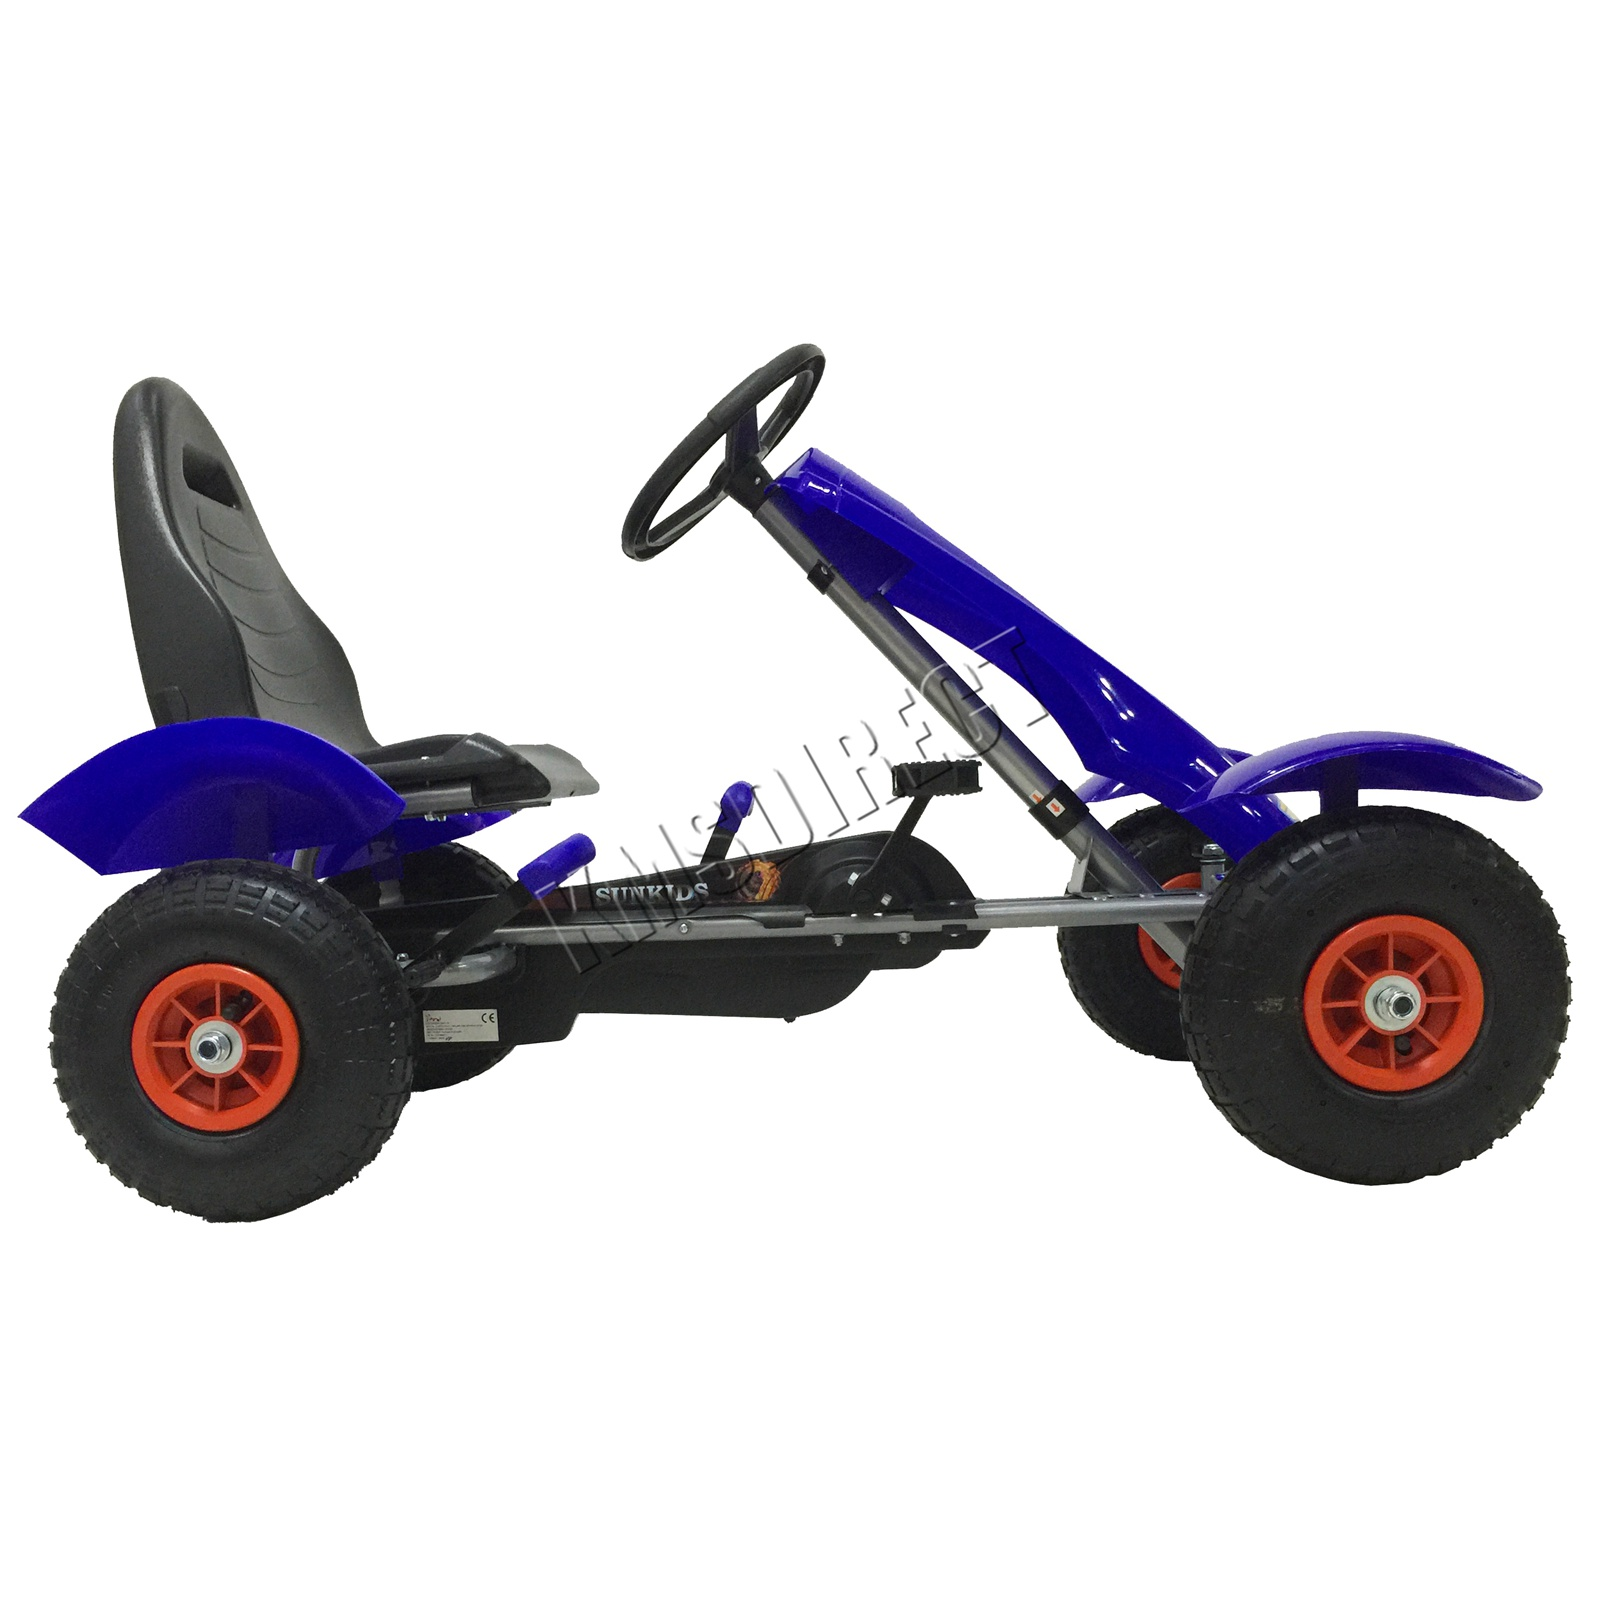 201701719267 2475 I 252 19 GOKART FH G03 BLUE KMSWM033 - Foxhunter Infantil Go Kart – Pedal Coche para Niños Gocart con Freno de Mano G03